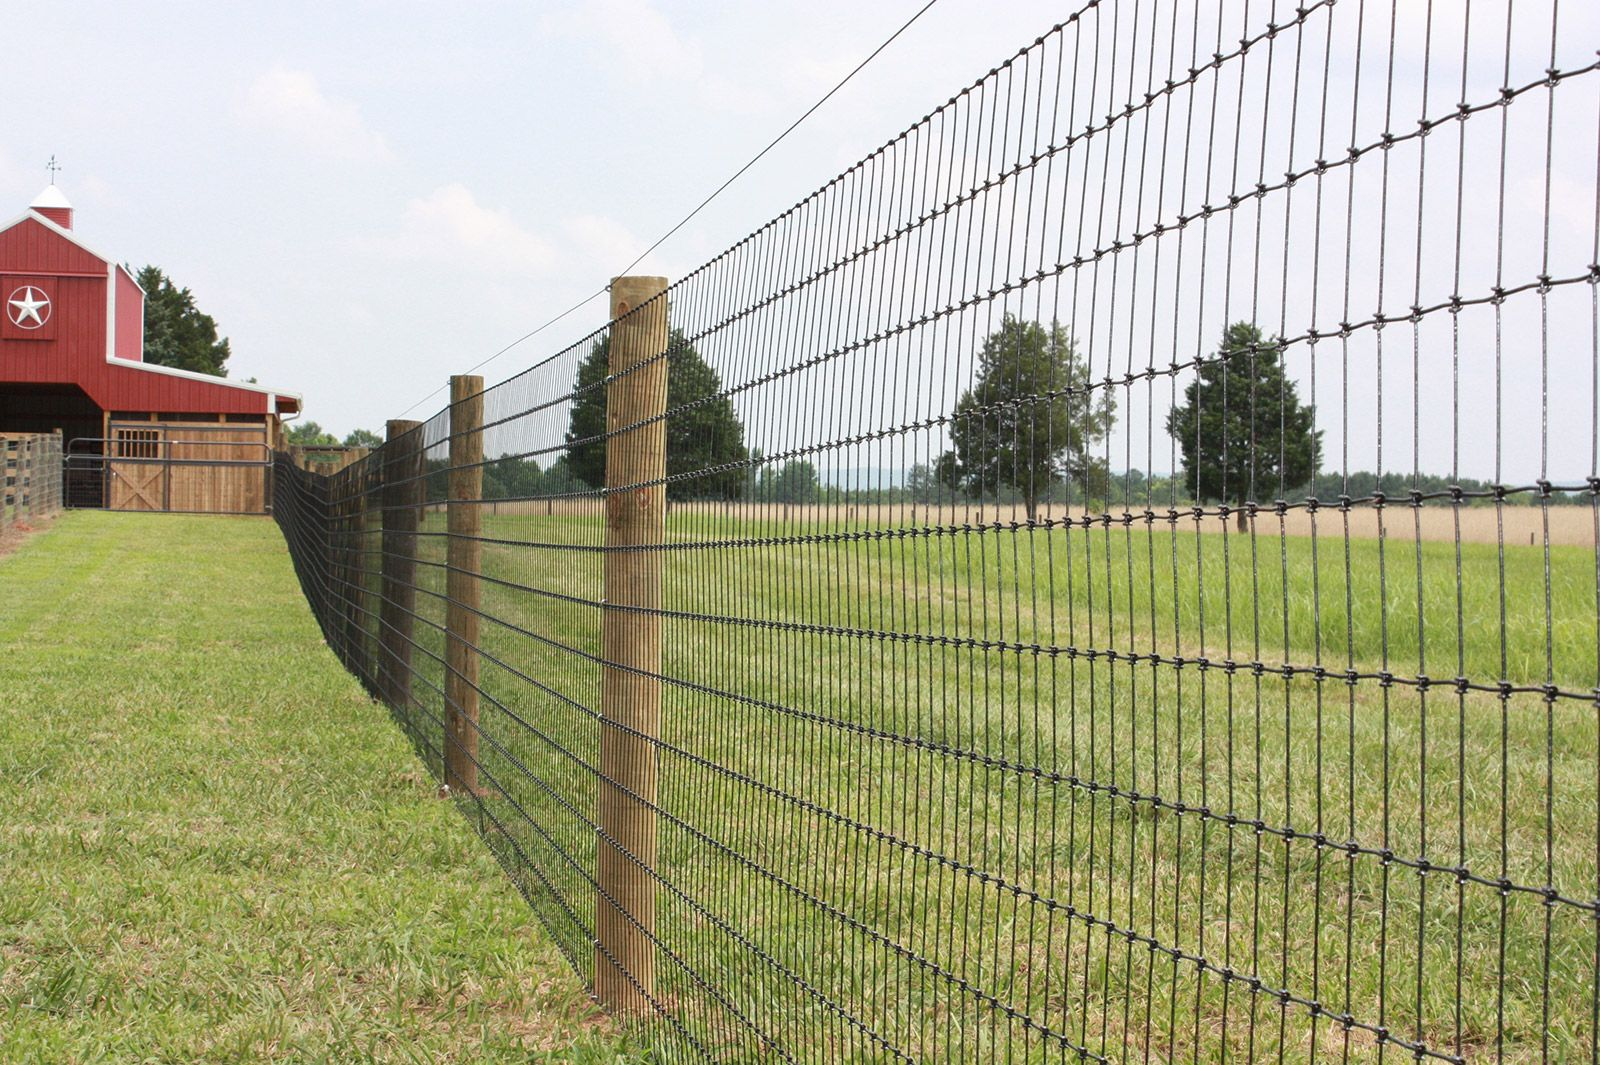 wooden farm fence. Wooden Farm Fence - Google Search E